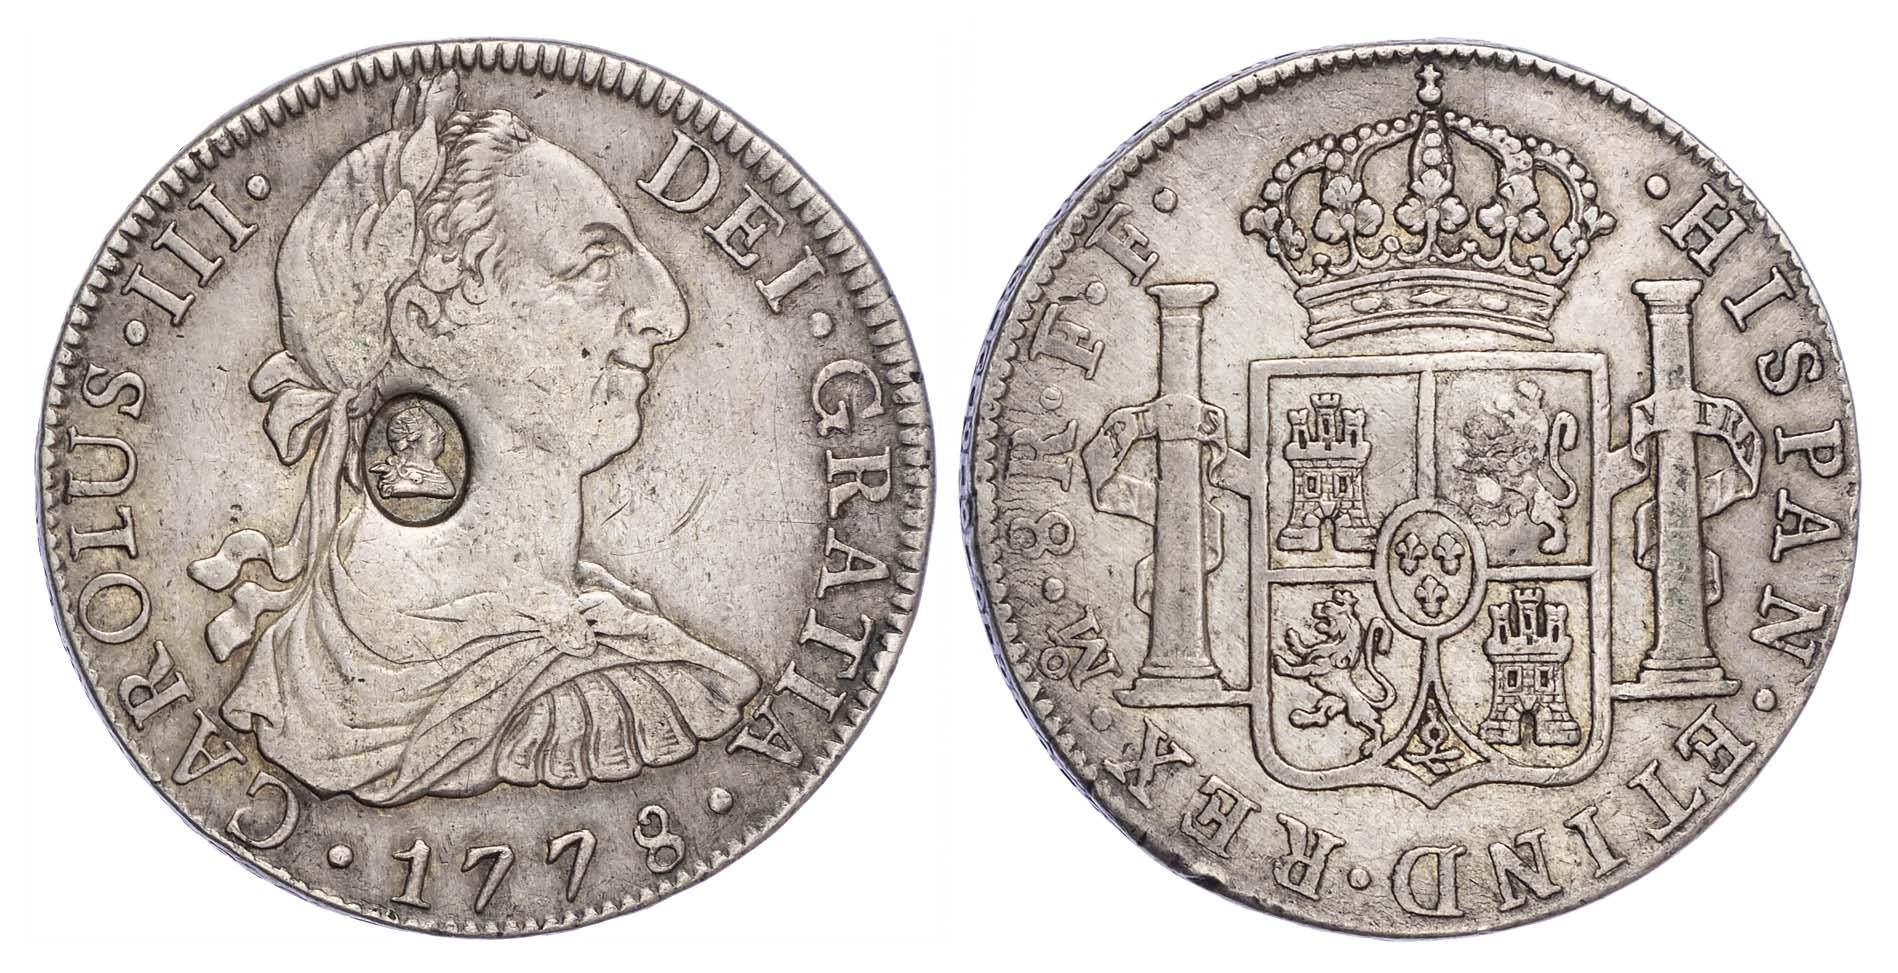 George III (1760-1820), Oval countermark struck on Spanish Eight Reales of King Charles III, 1778